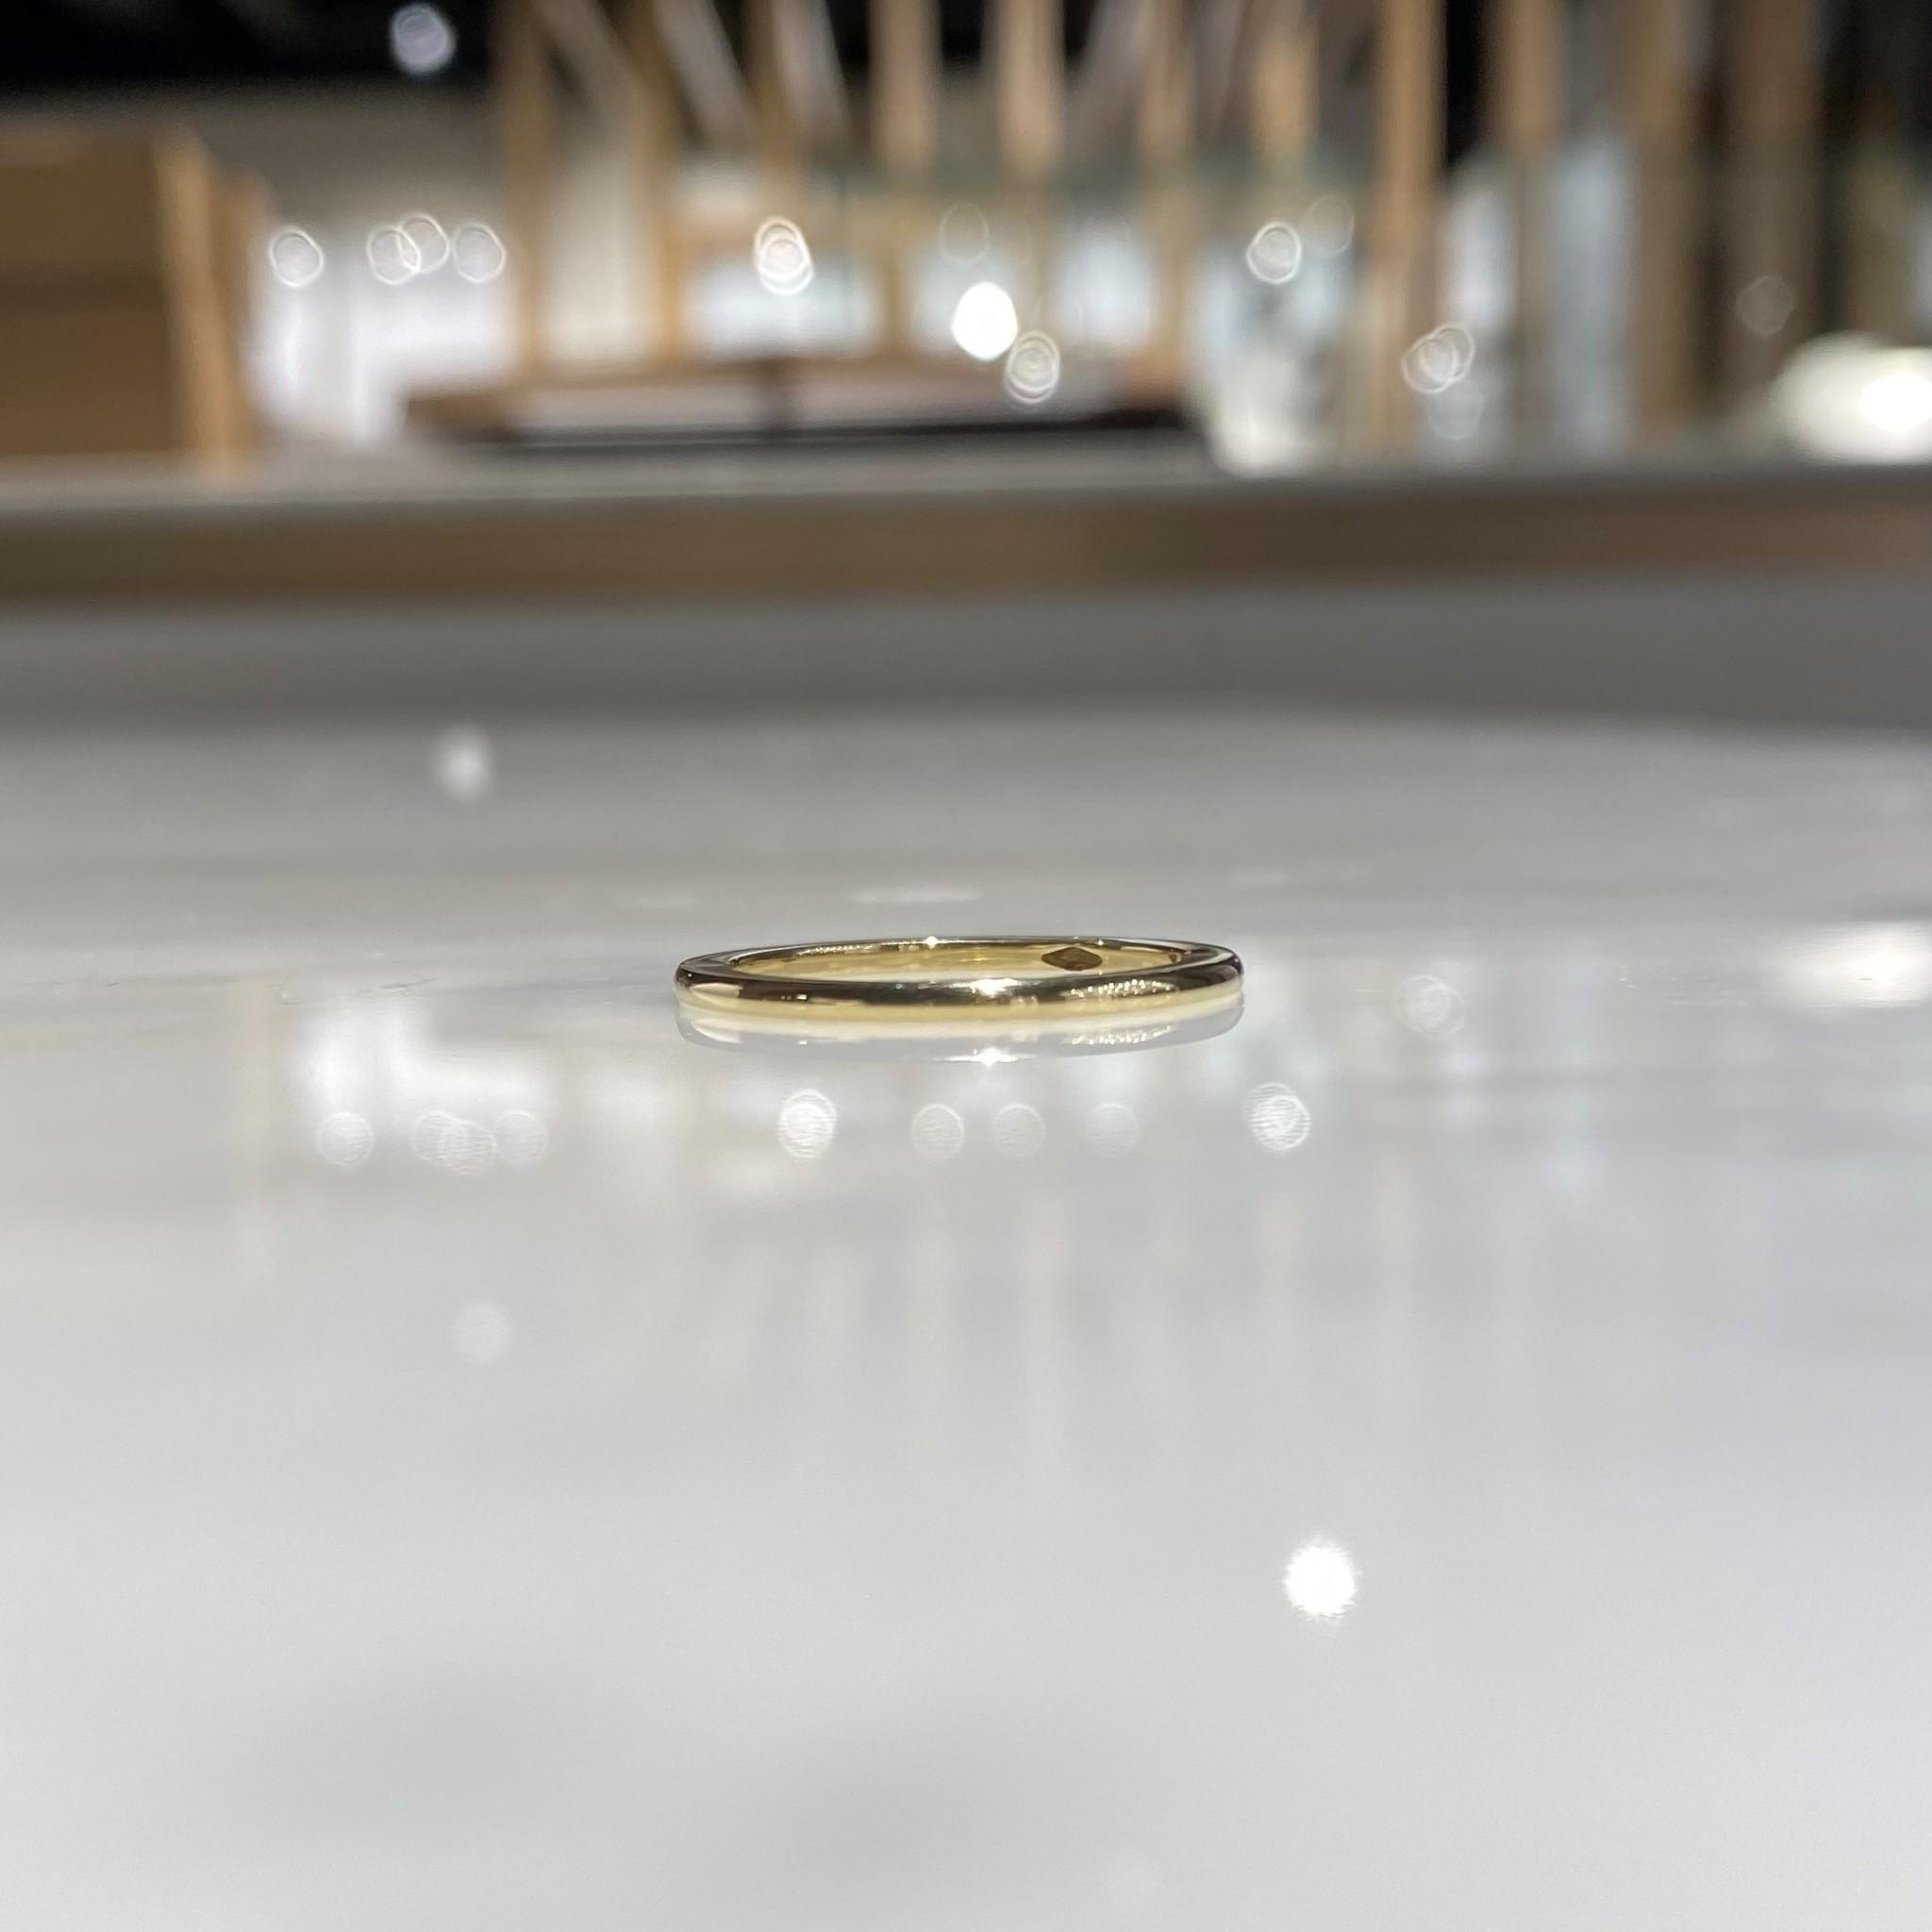 Tomylo 14 karaat geelgouden ring.